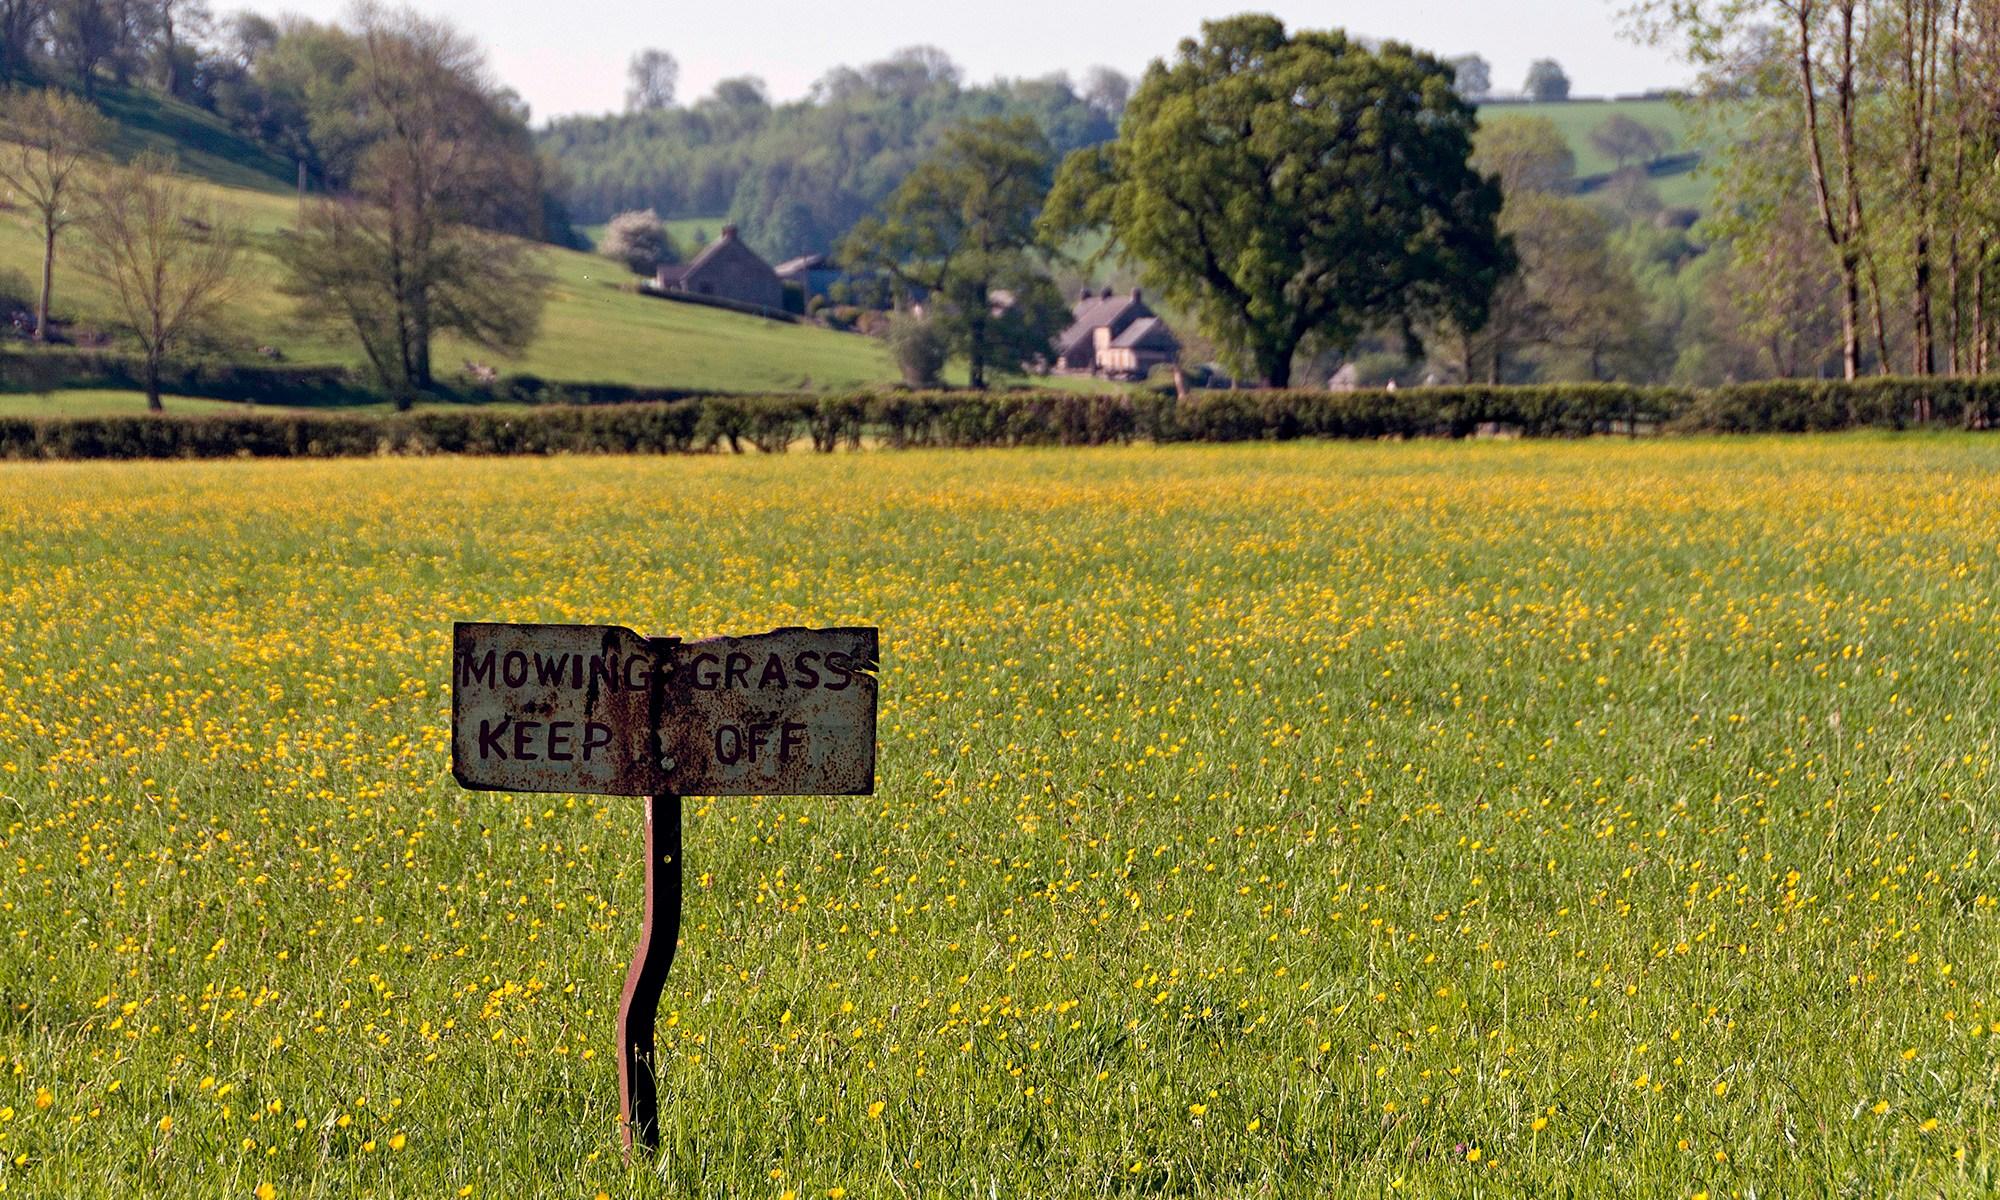 Mowing Grass - Keep Off